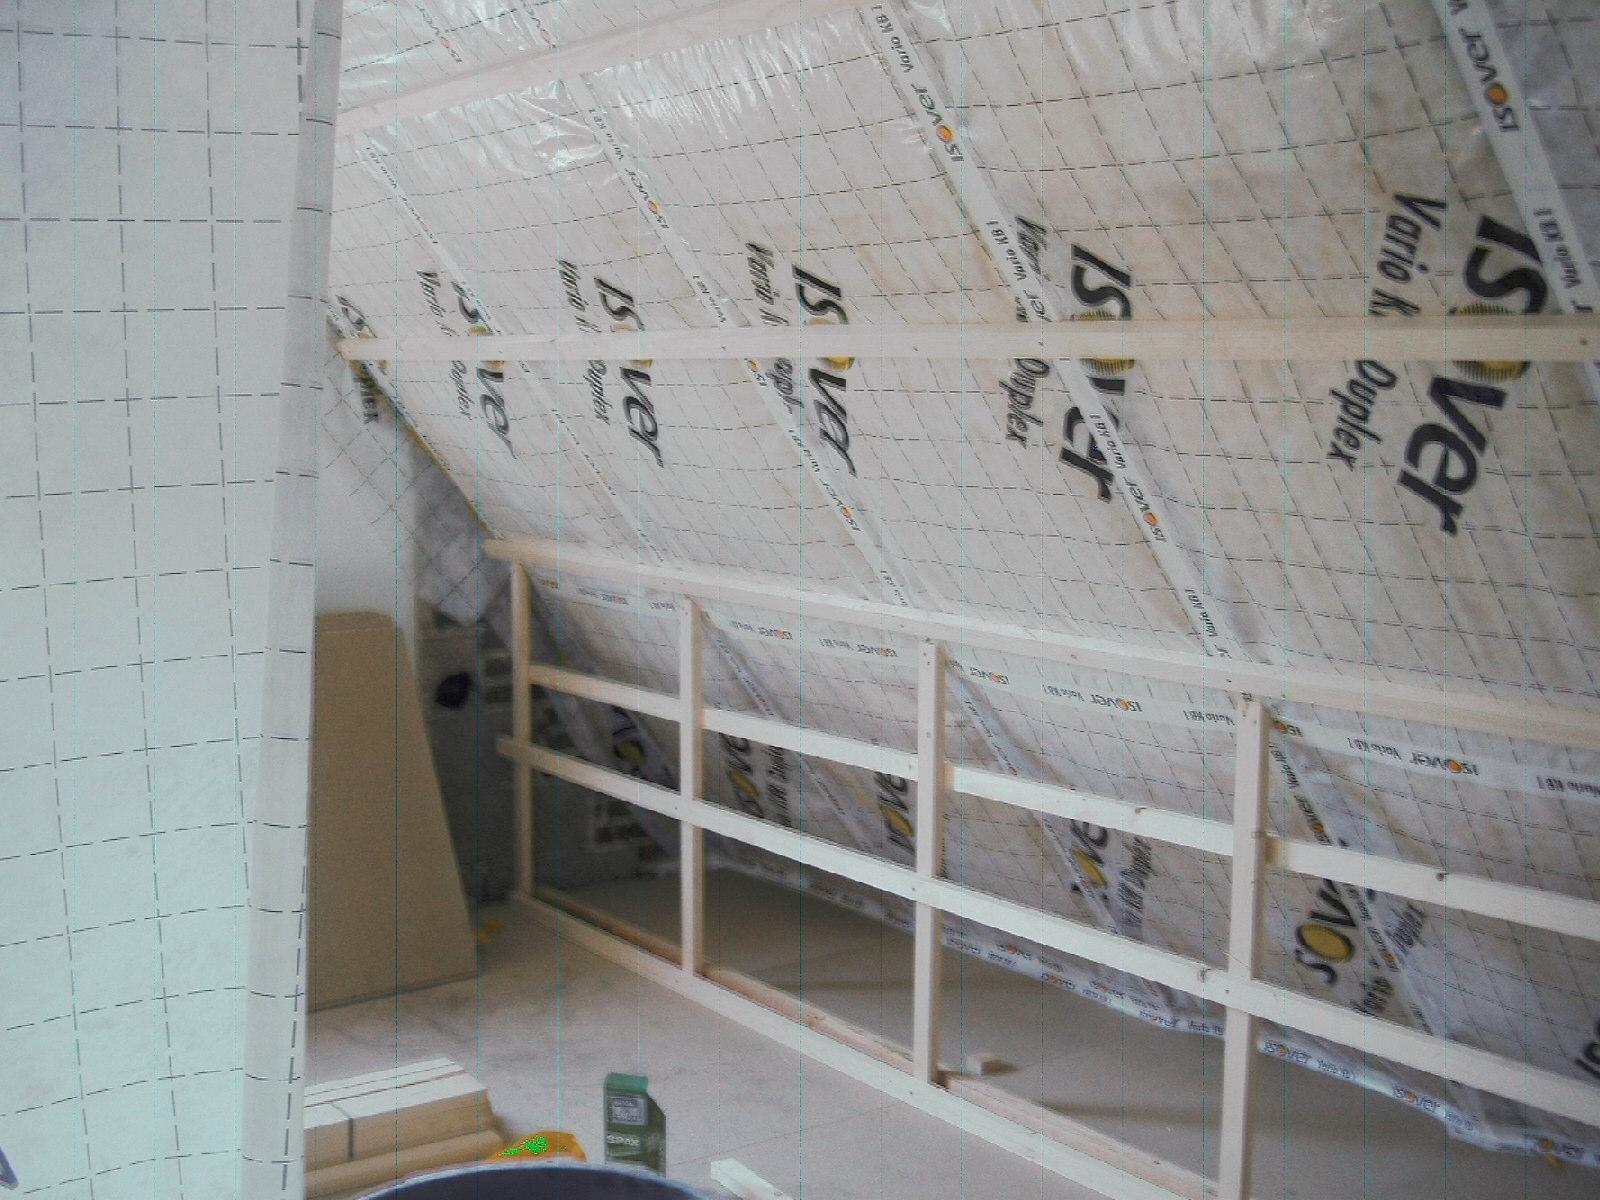 obergescho d mmen projekt heimwerken. Black Bedroom Furniture Sets. Home Design Ideas